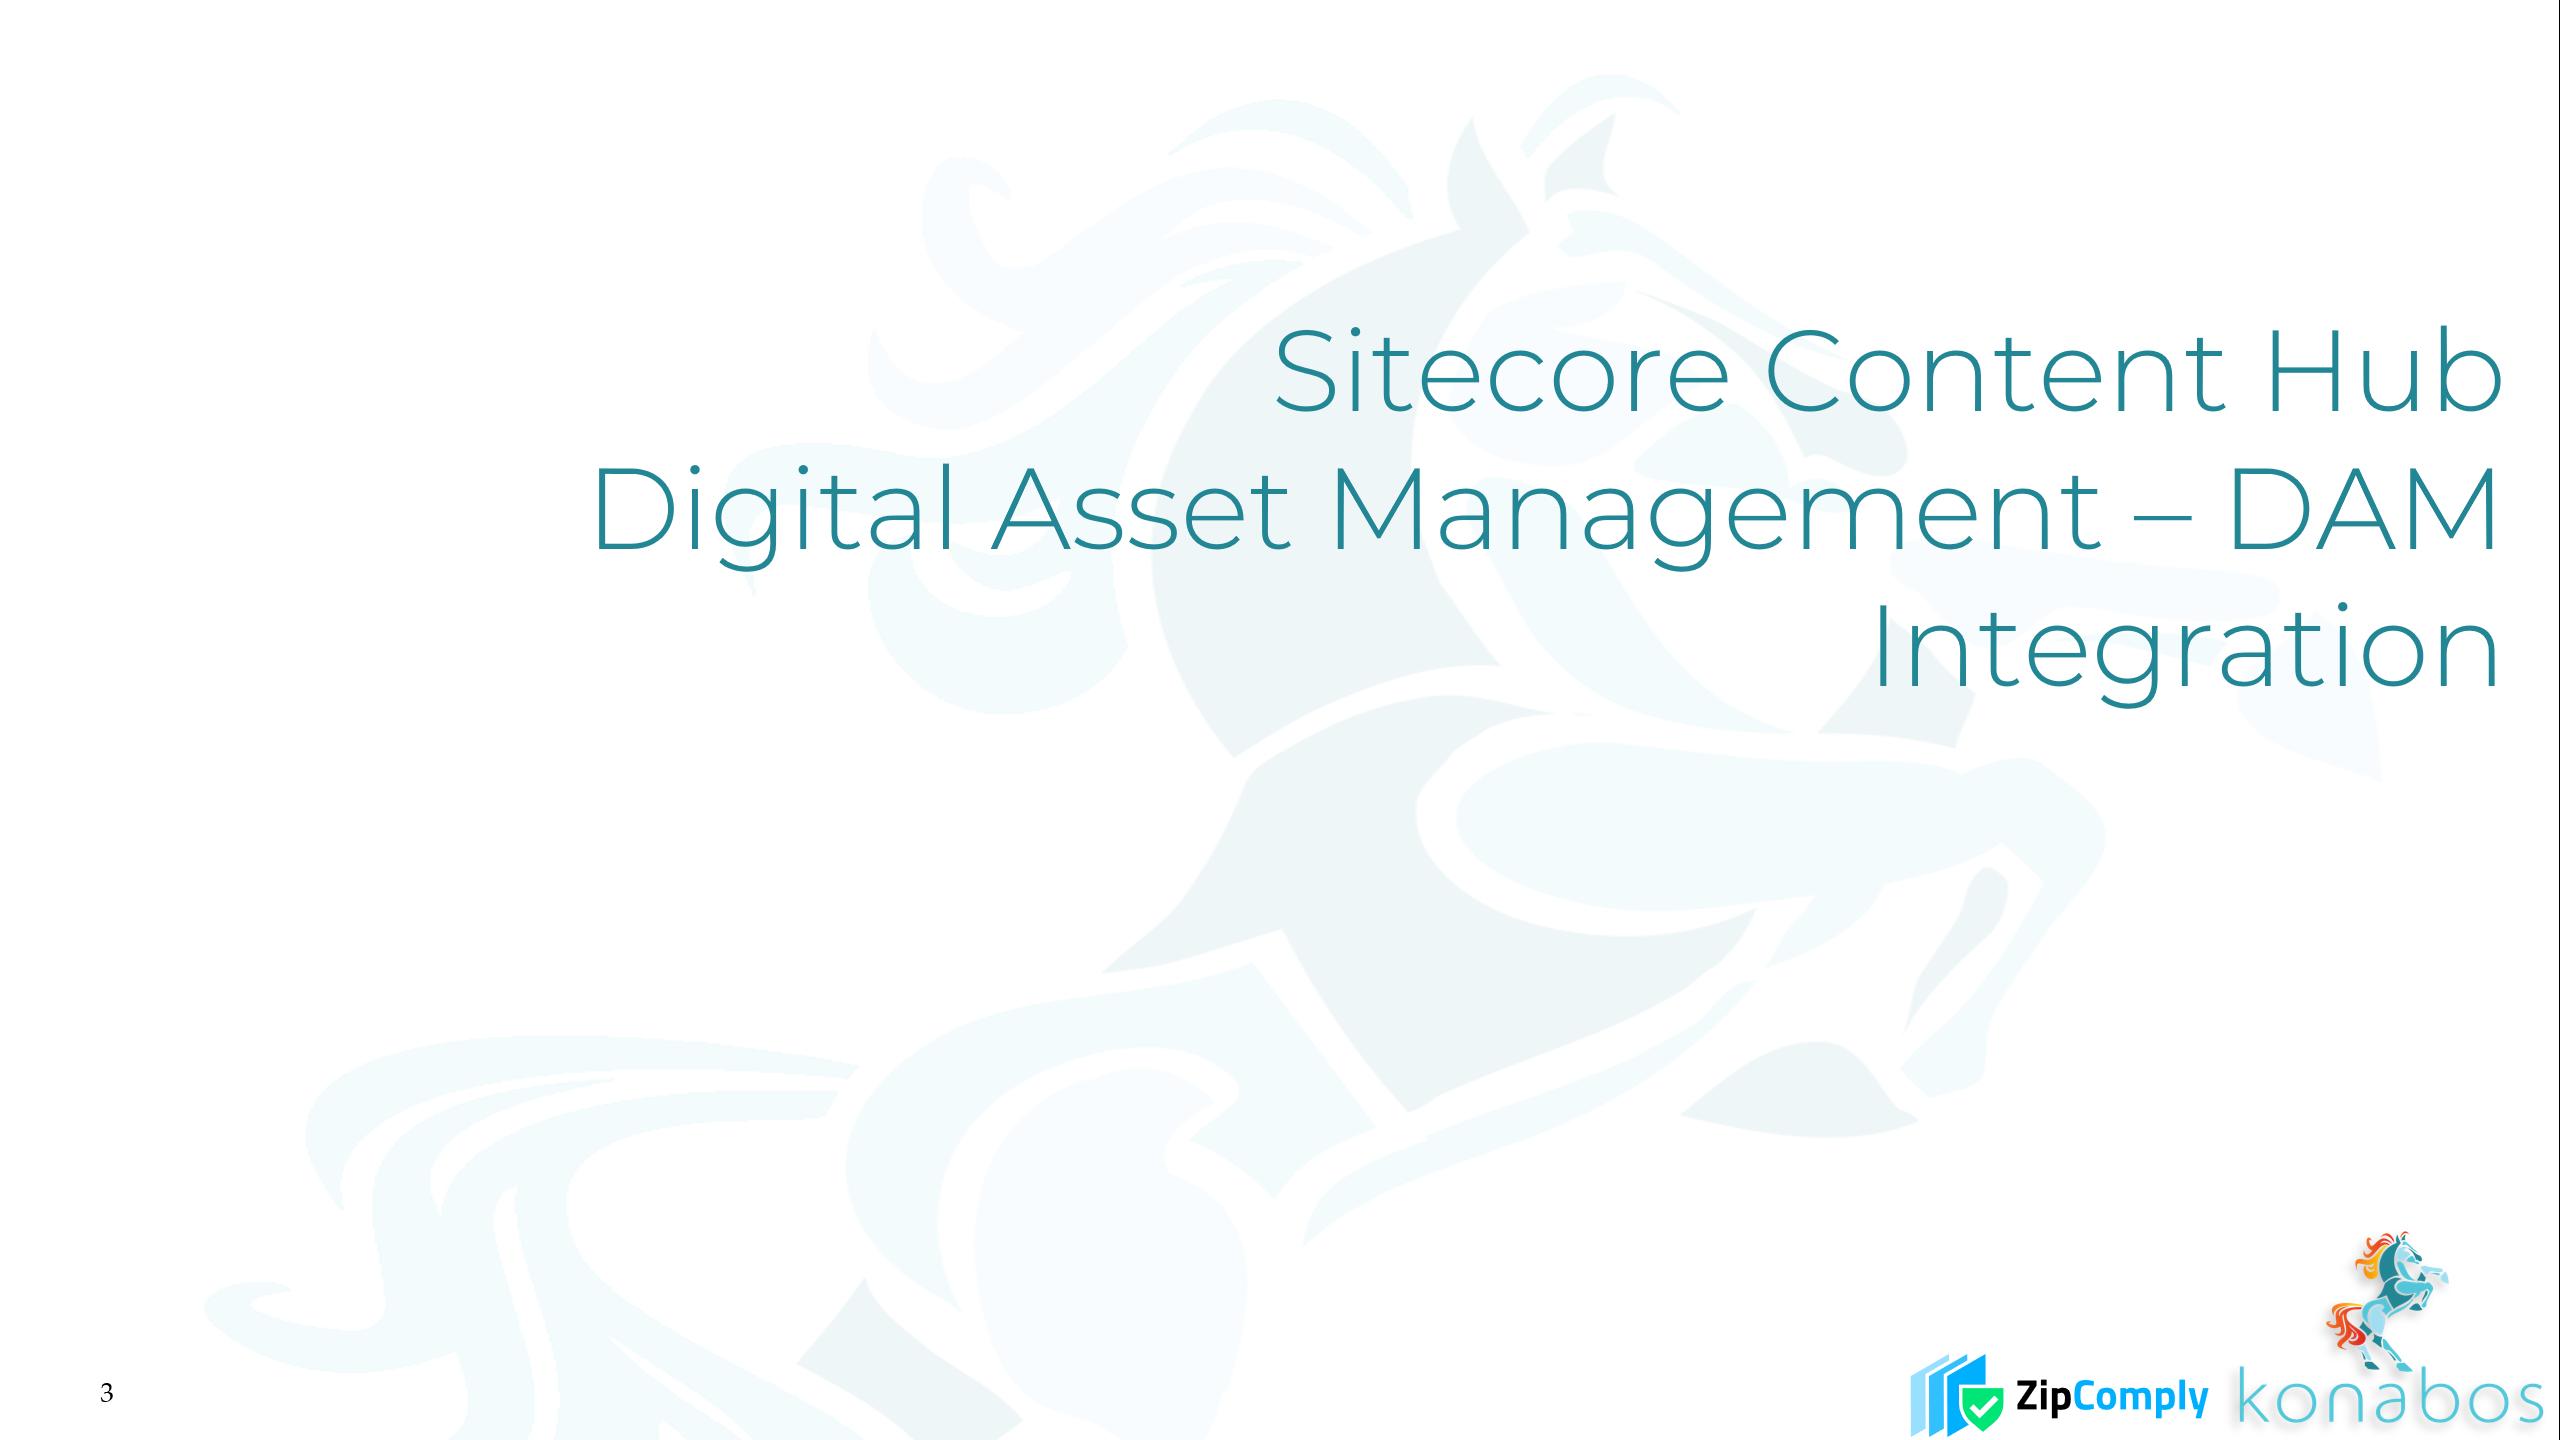 Sitecore Content Hub - Digital Asset Management - DAM - Integration